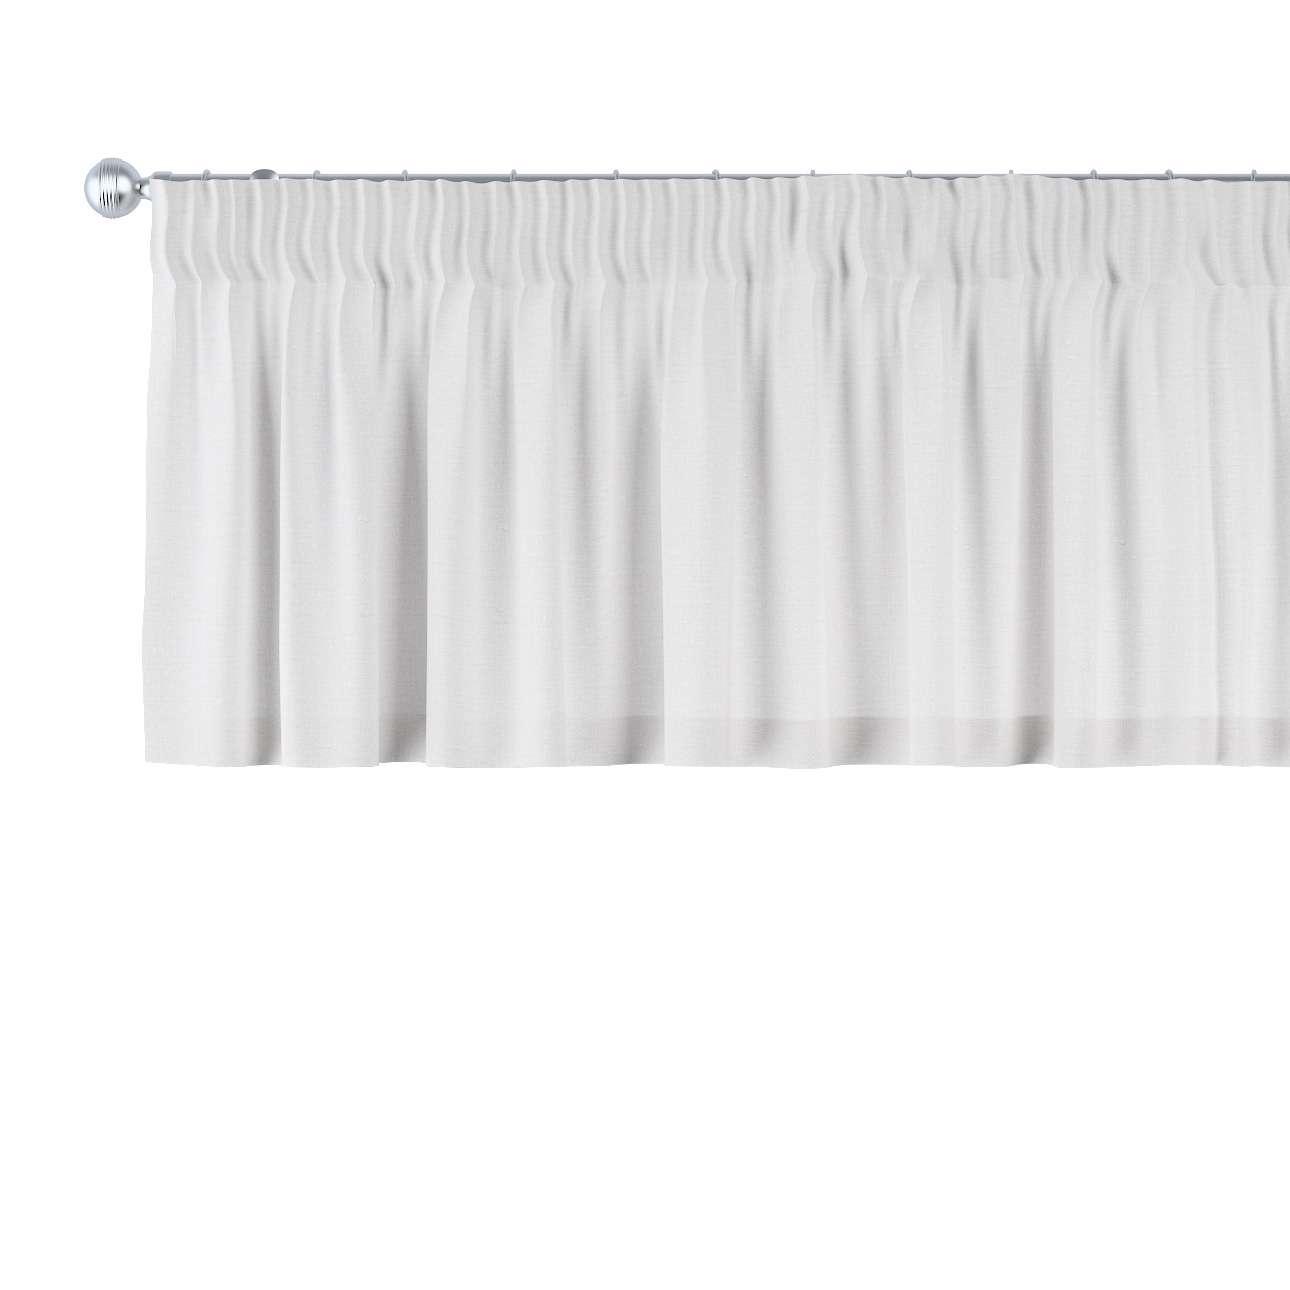 Lambrekin na řasící pásce 130 x 40 cm v kolekci Linen, látka: 392-04